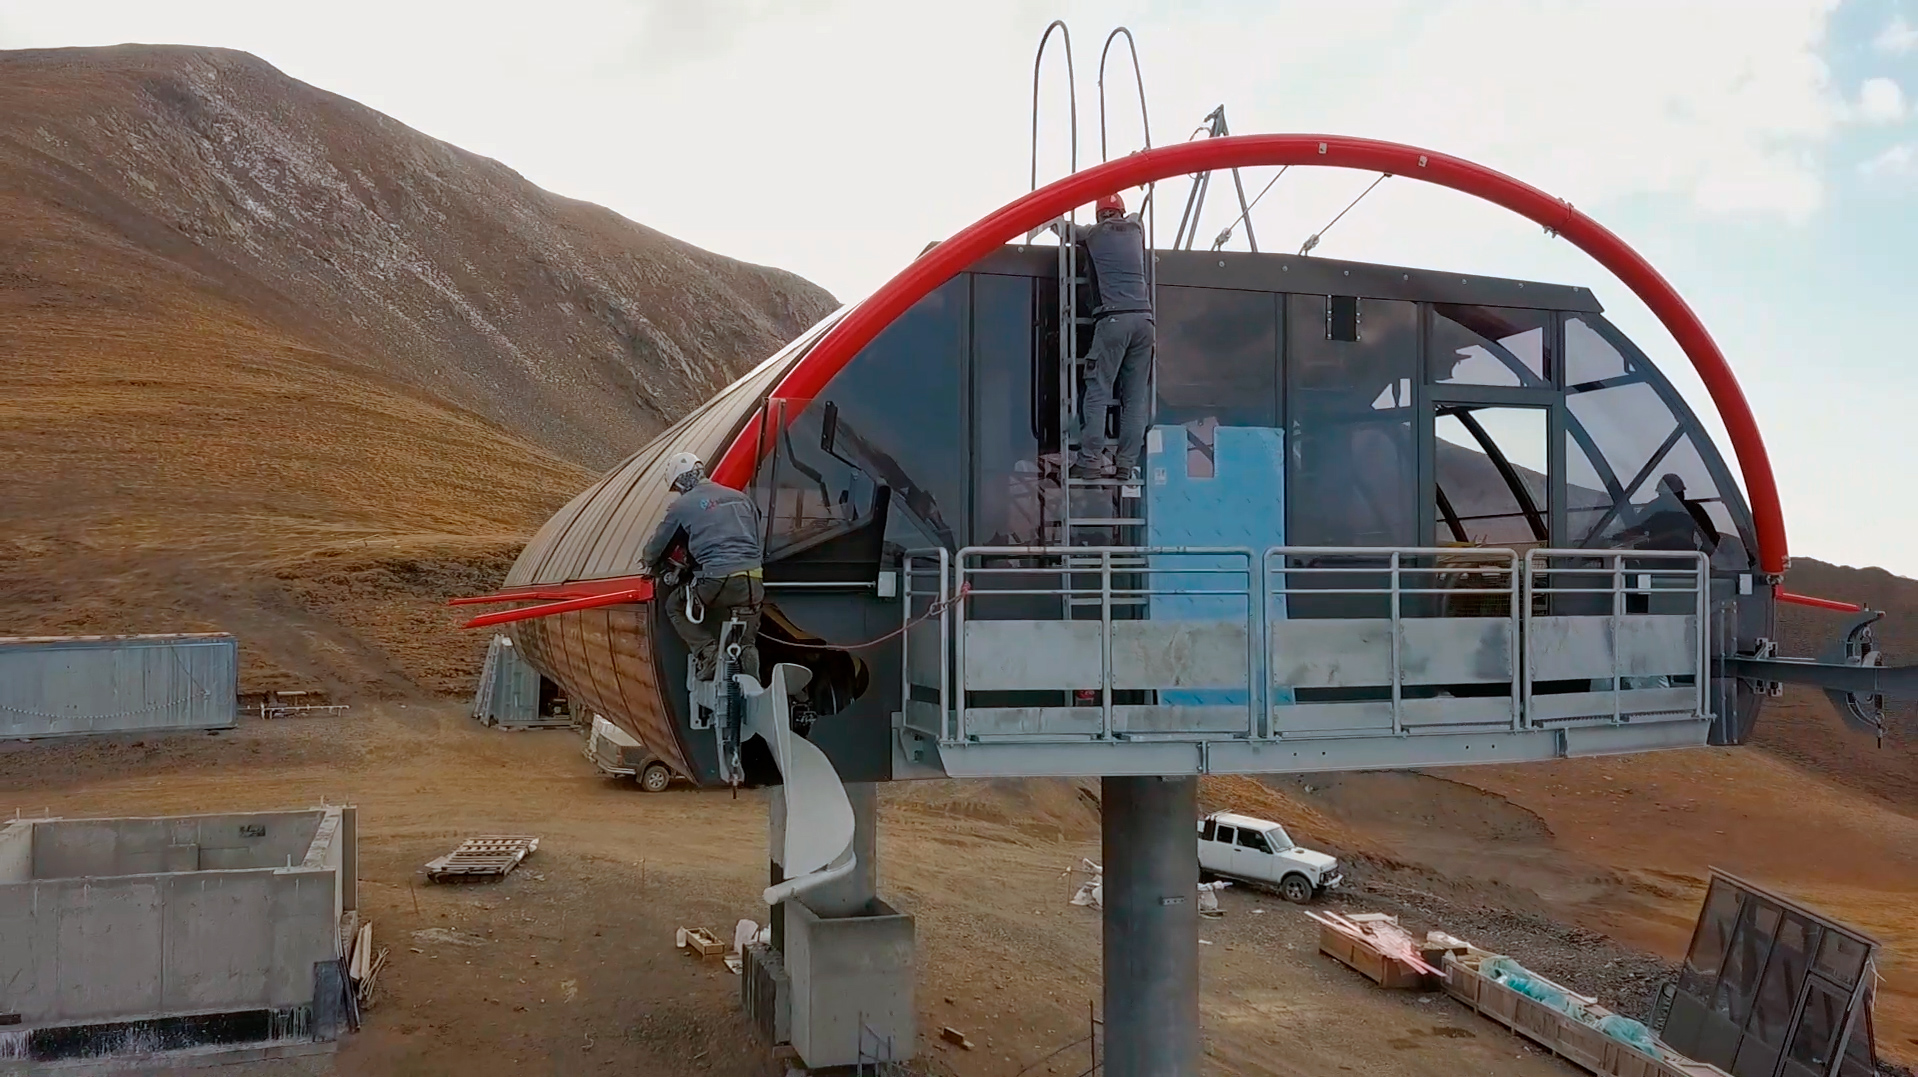 Продолжается монтаж комплекса канатных дорог на ВТРК Архыз